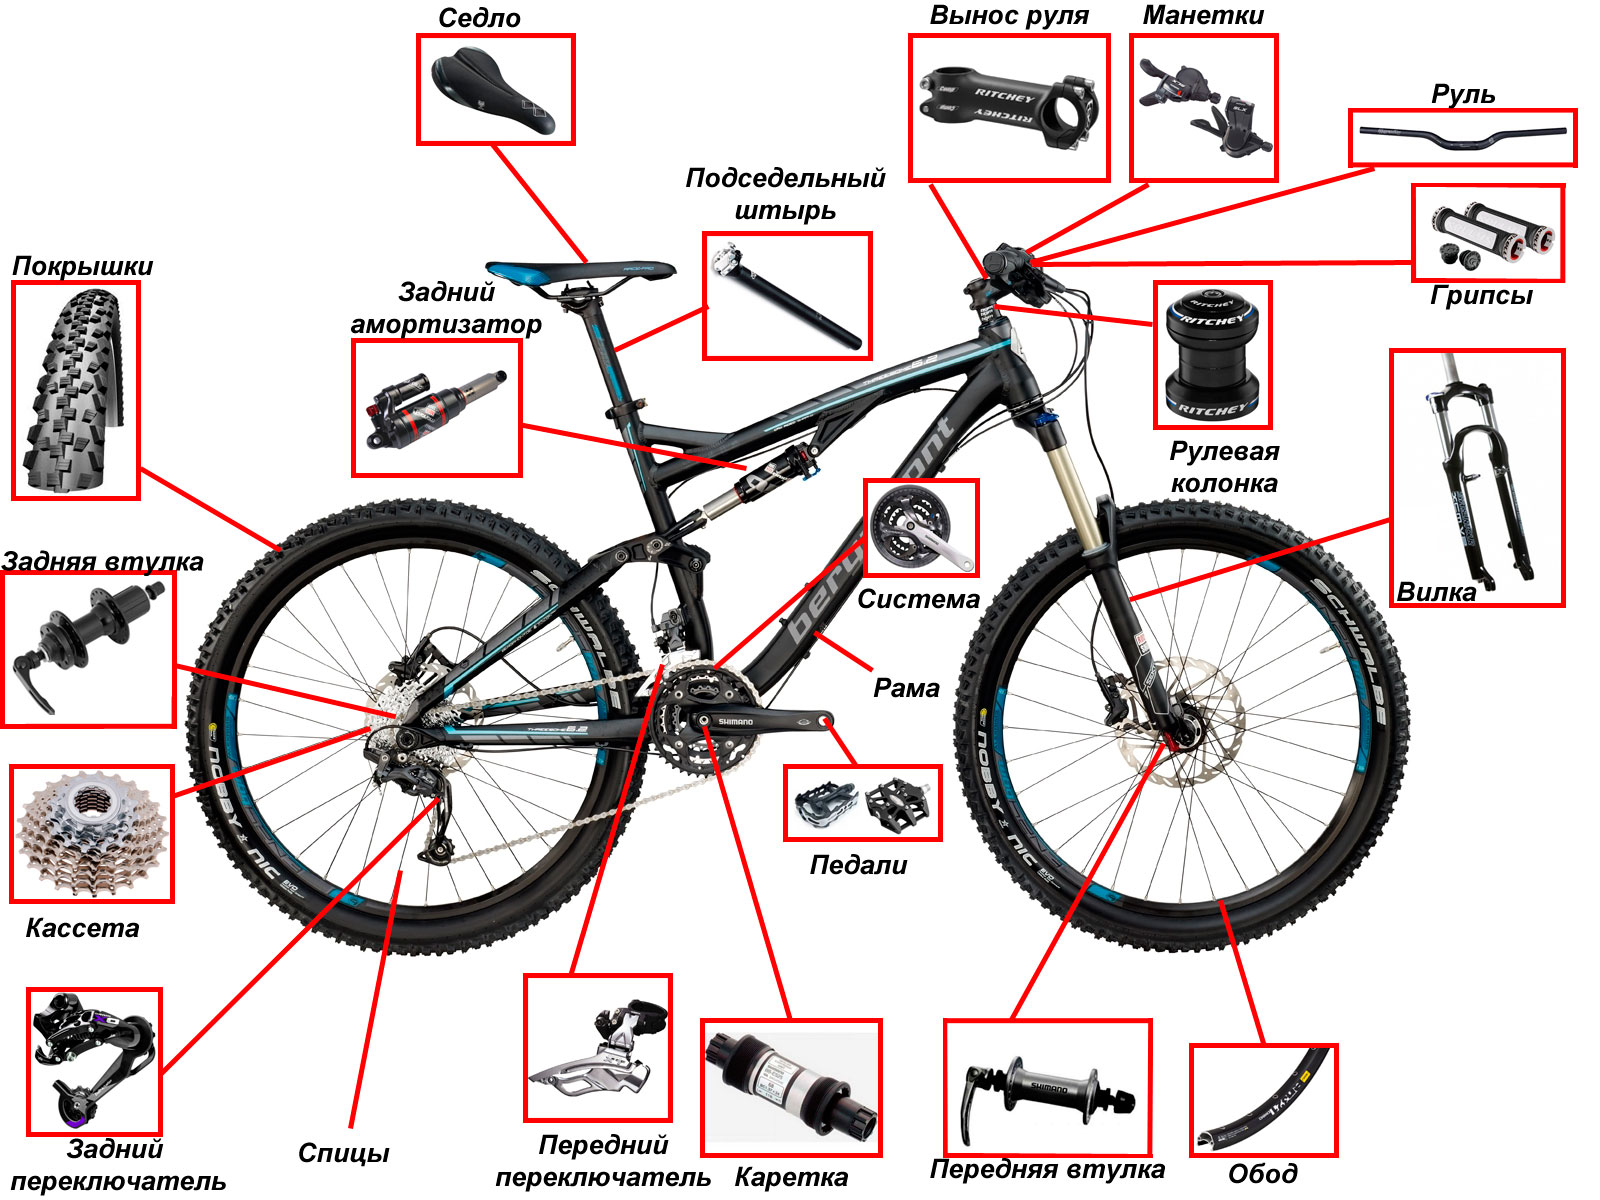 Вилка на велосипед: устройство, ремонт, регулировка